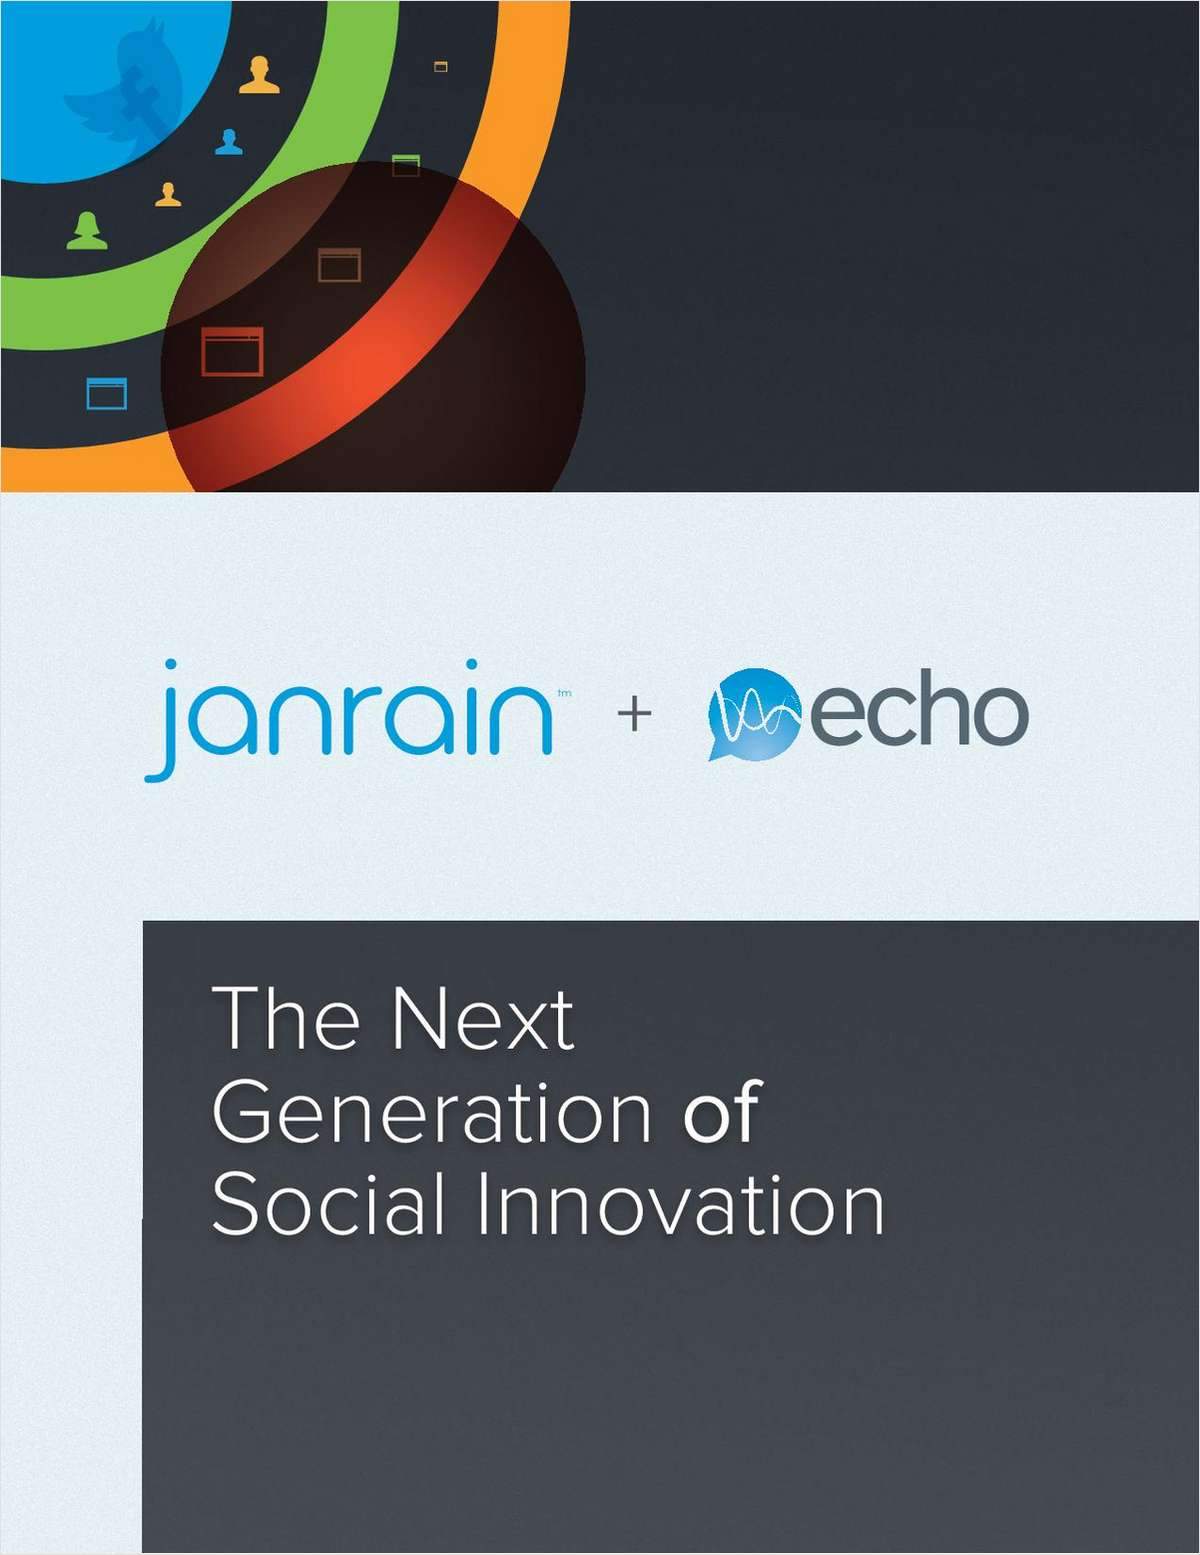 The Next Generation of Social Innovation